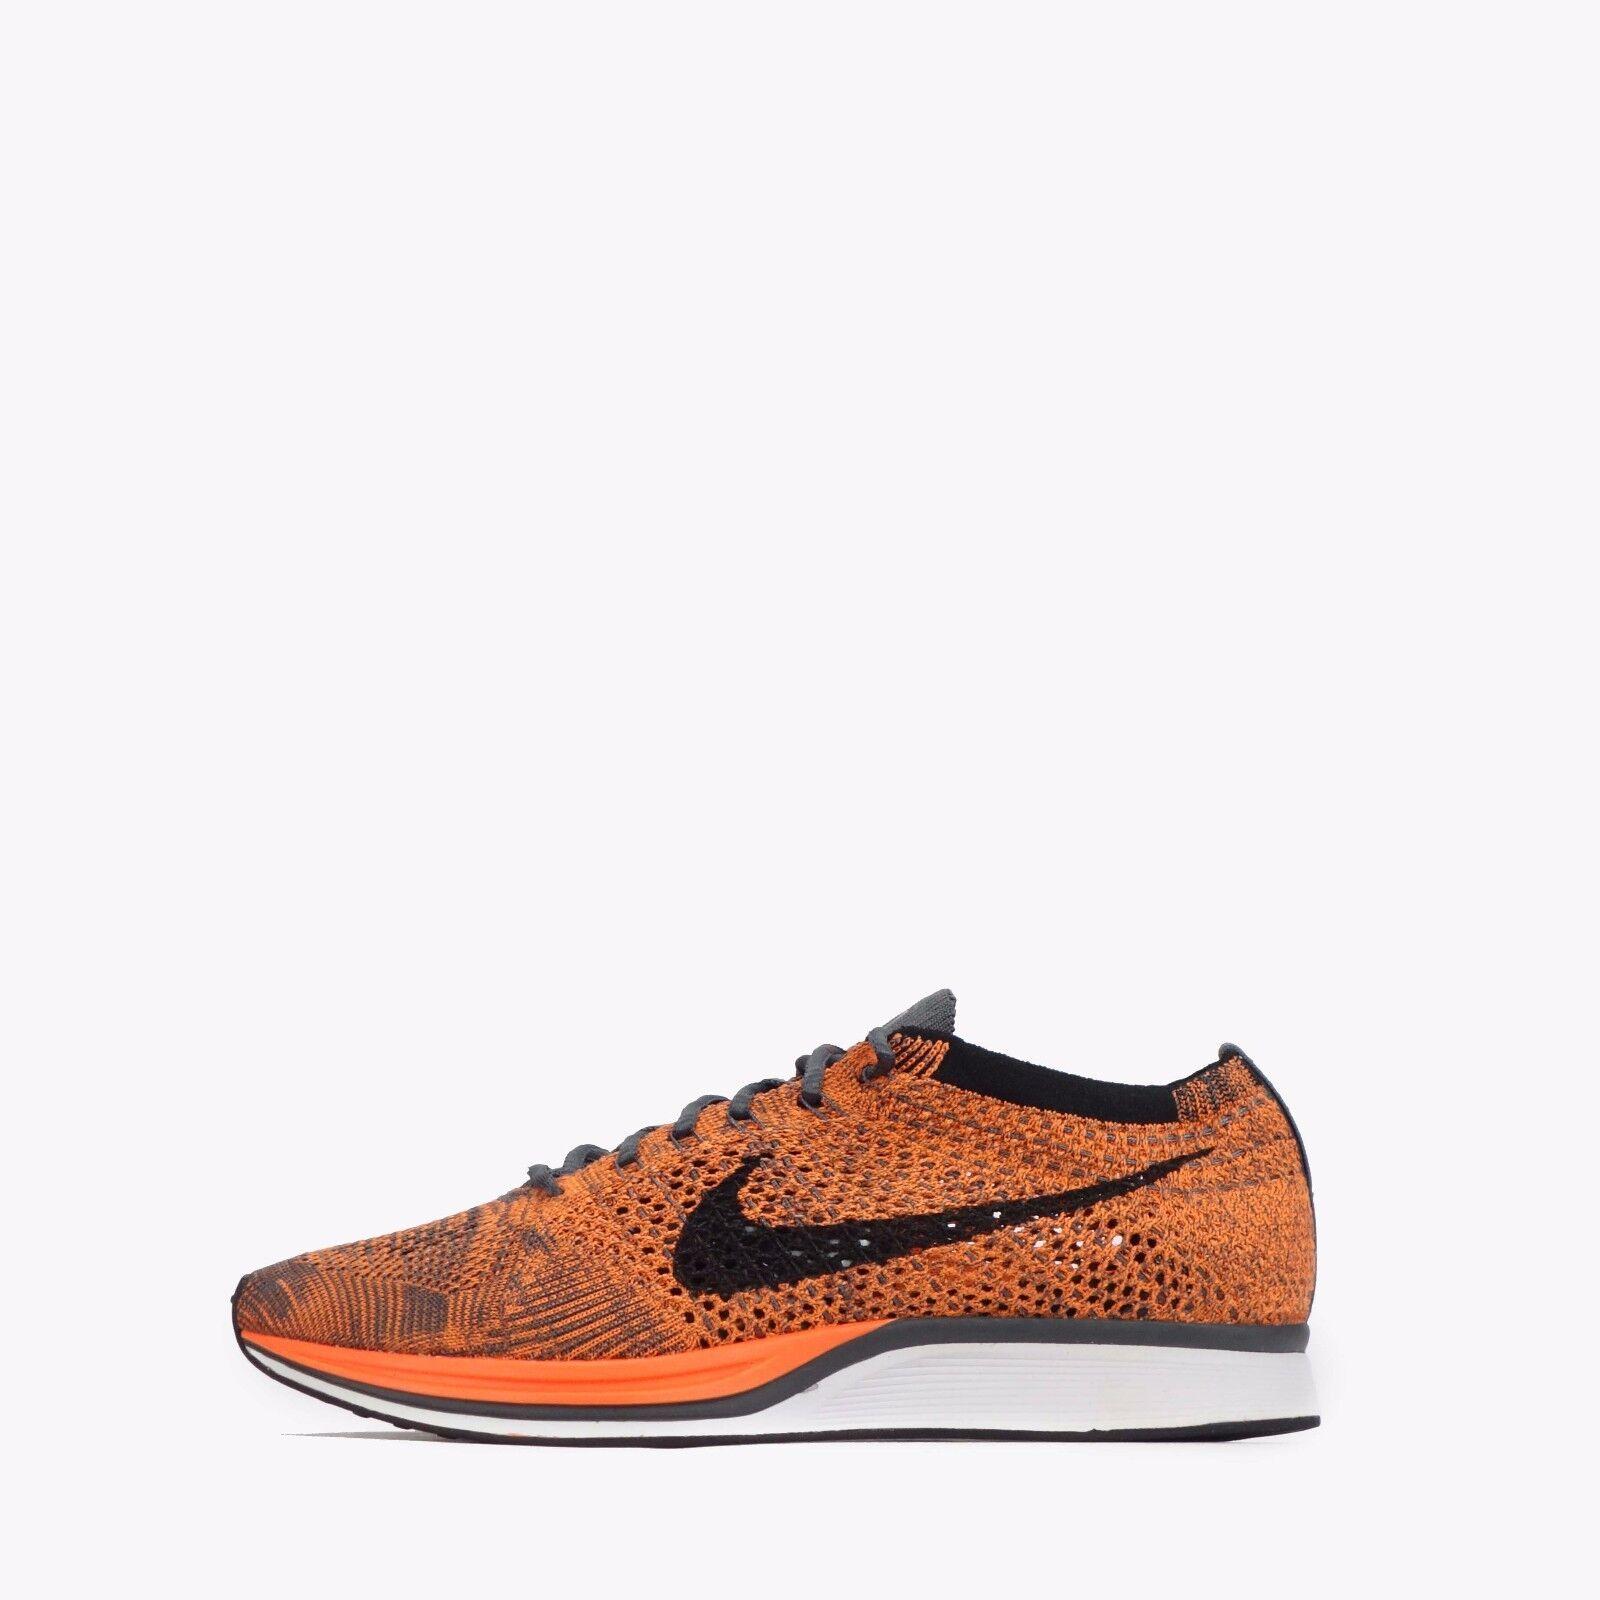 Nike Flyknit Racer Mens damen Unisex Running schuhe Total Orange Weiß